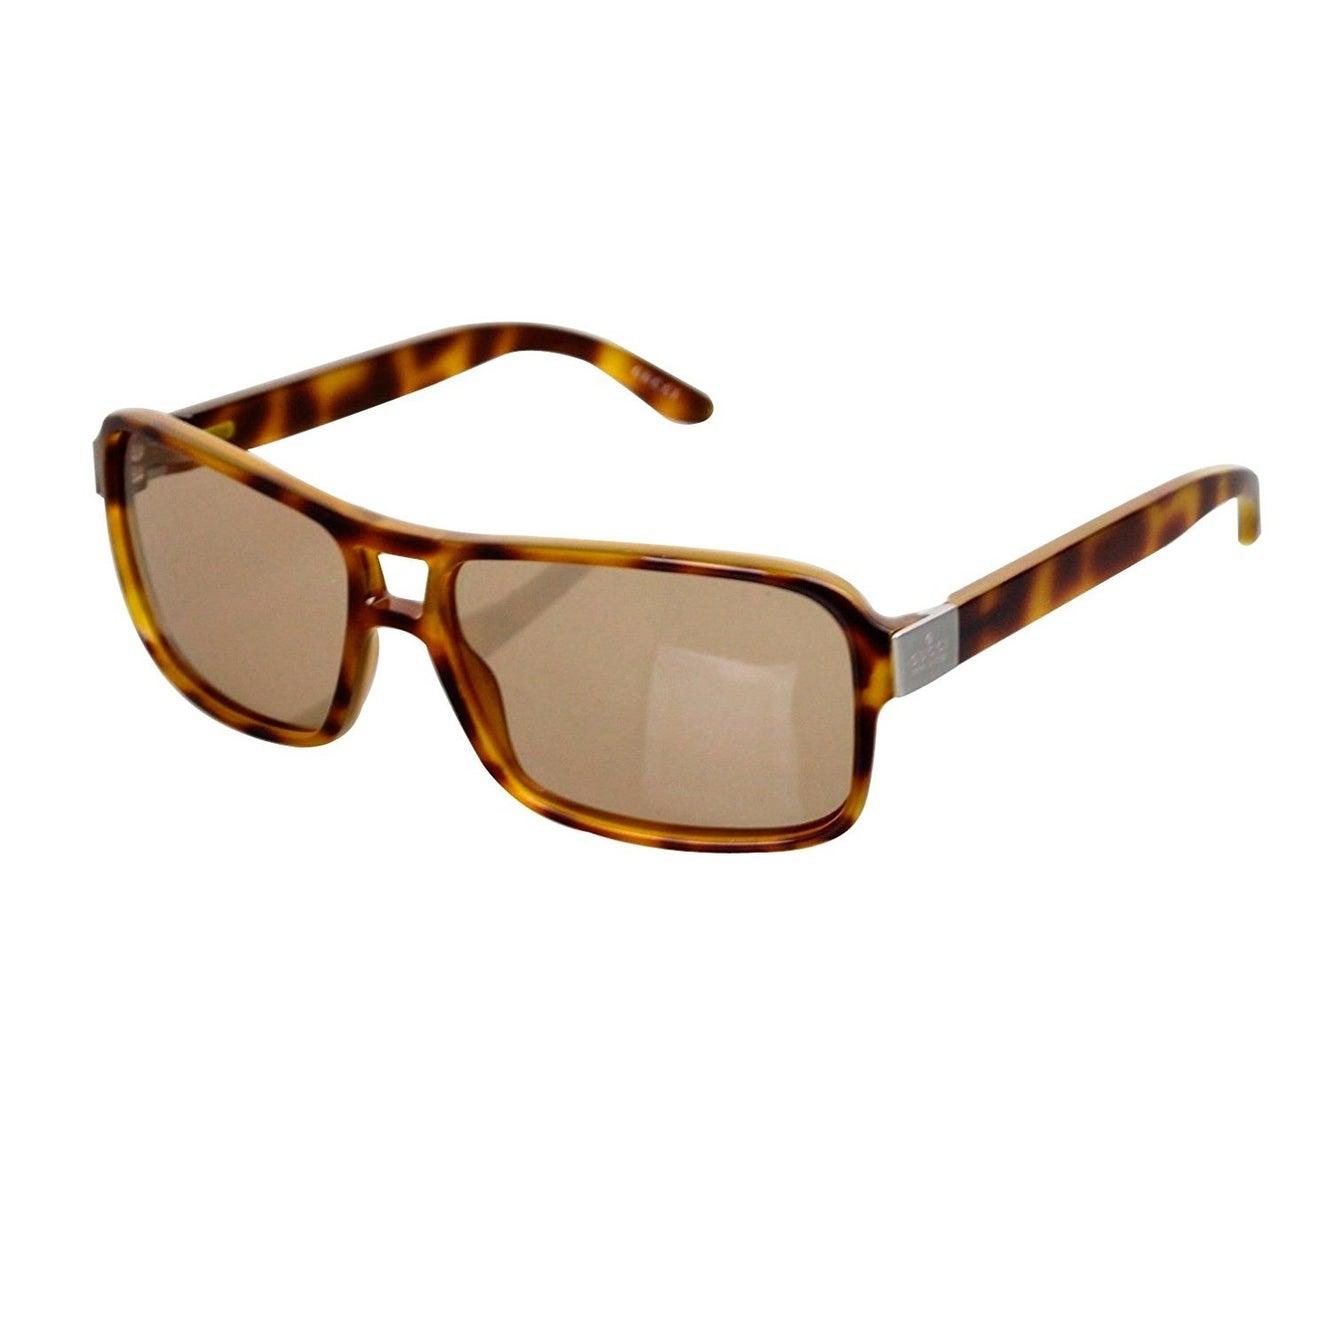 ebf4fc31822 Gucci Women s Designer Havana Acetate Metal Logo Sunglasses GG 1609 S A8LVG  - One size